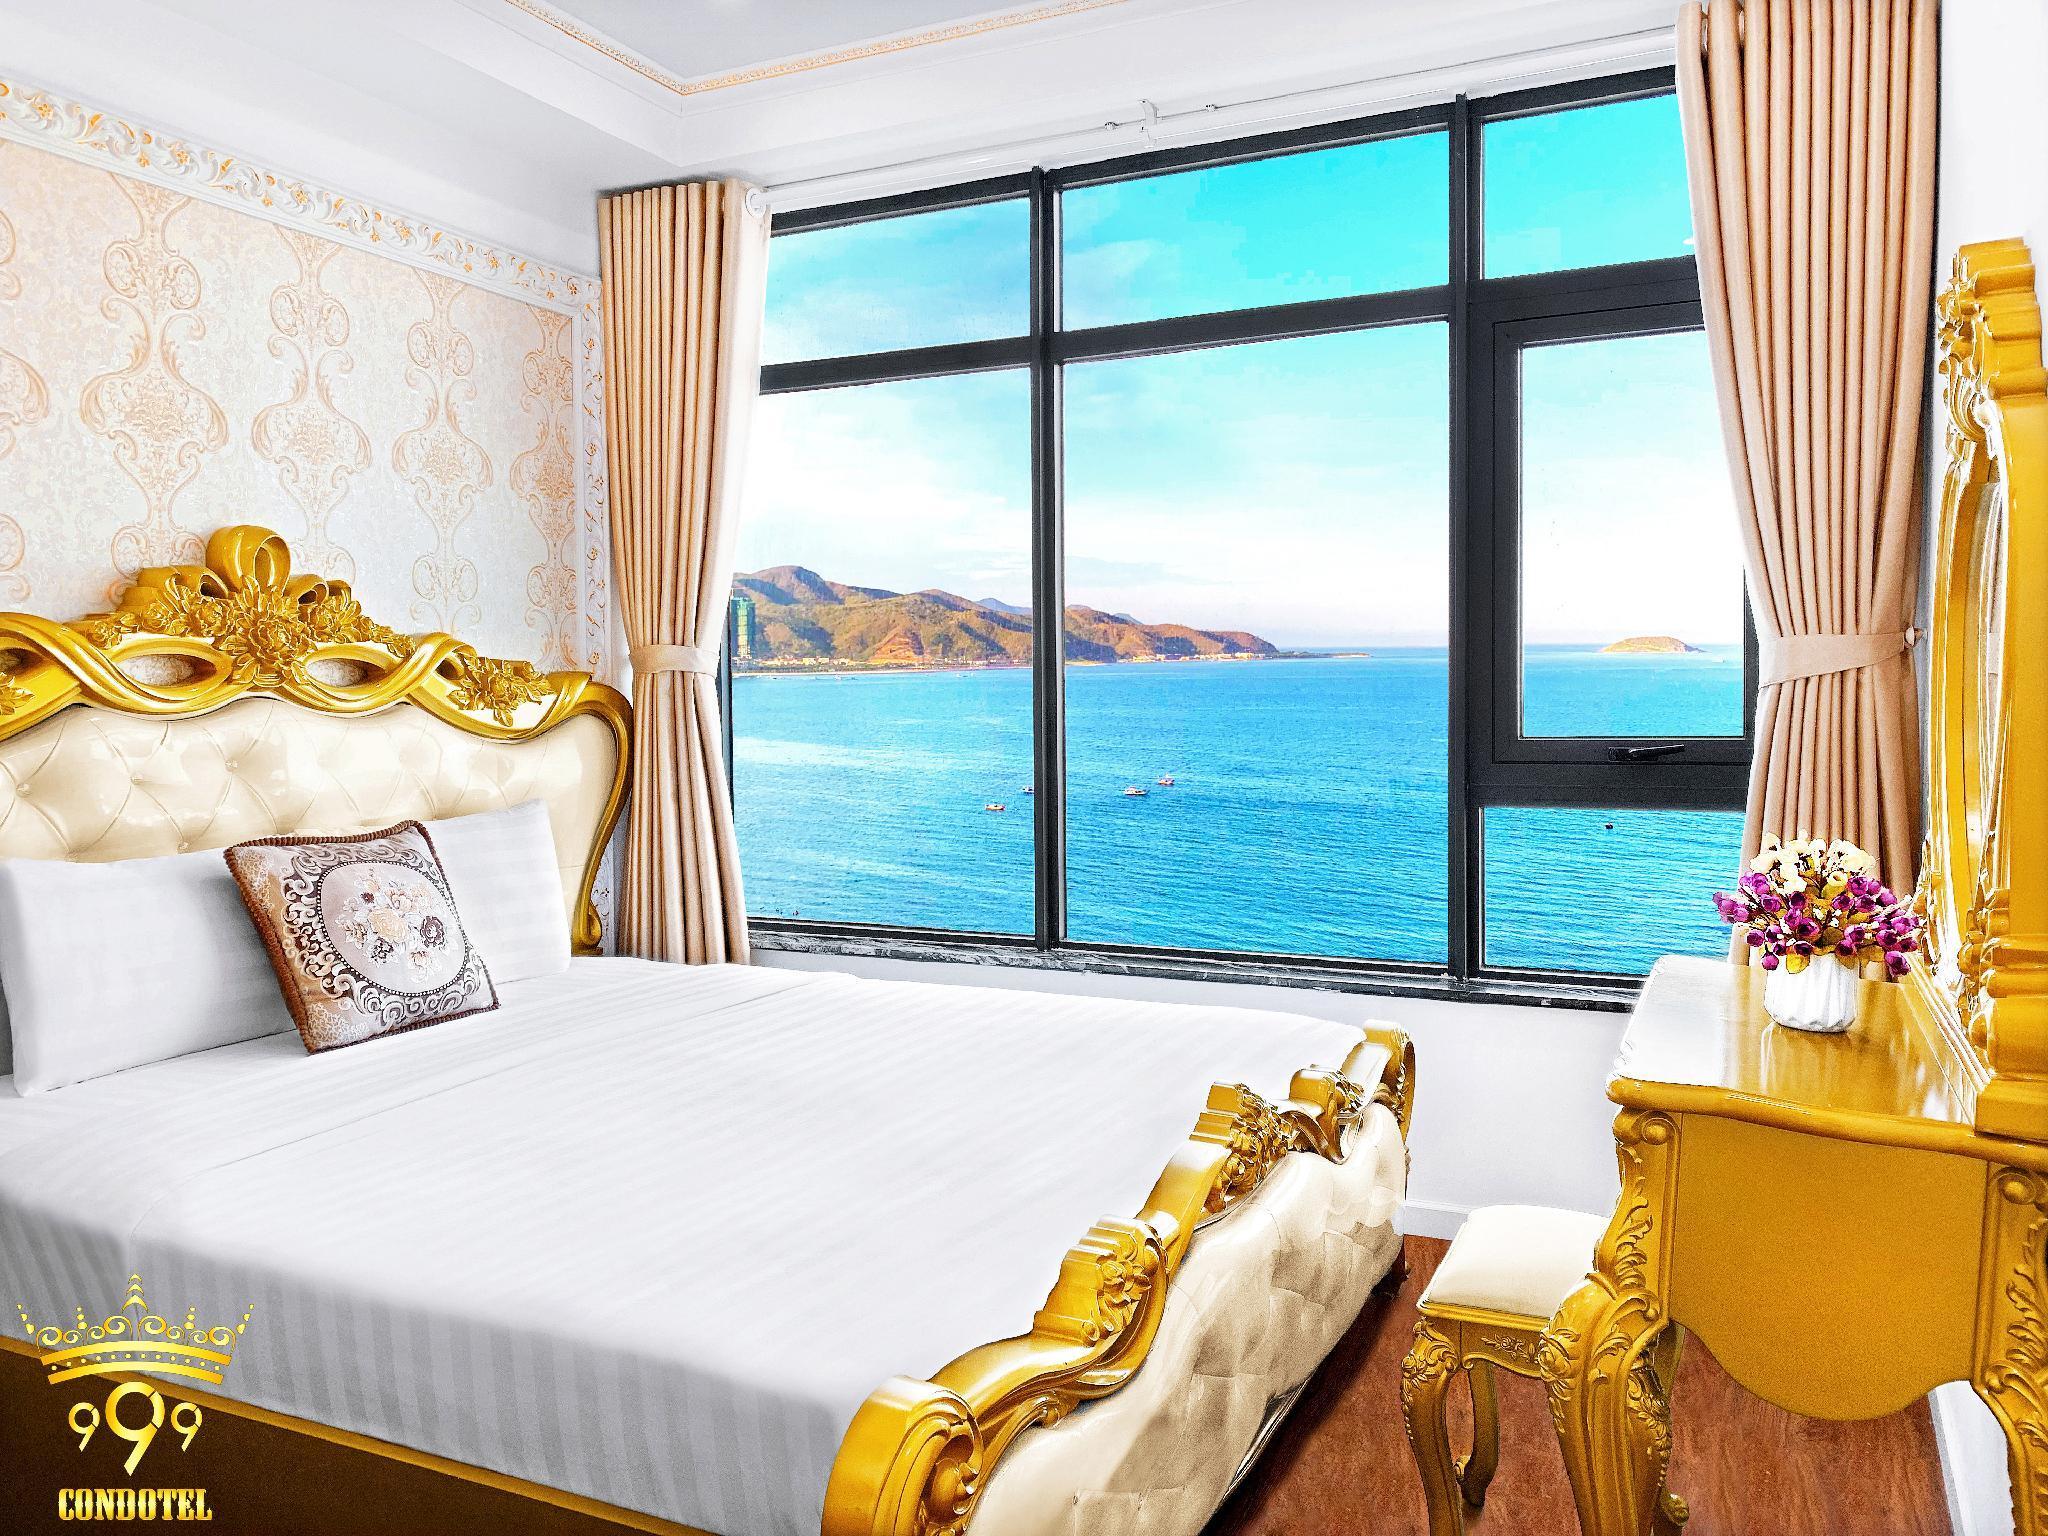 Luxury Apartment With Sea View   999 CONDOTEL